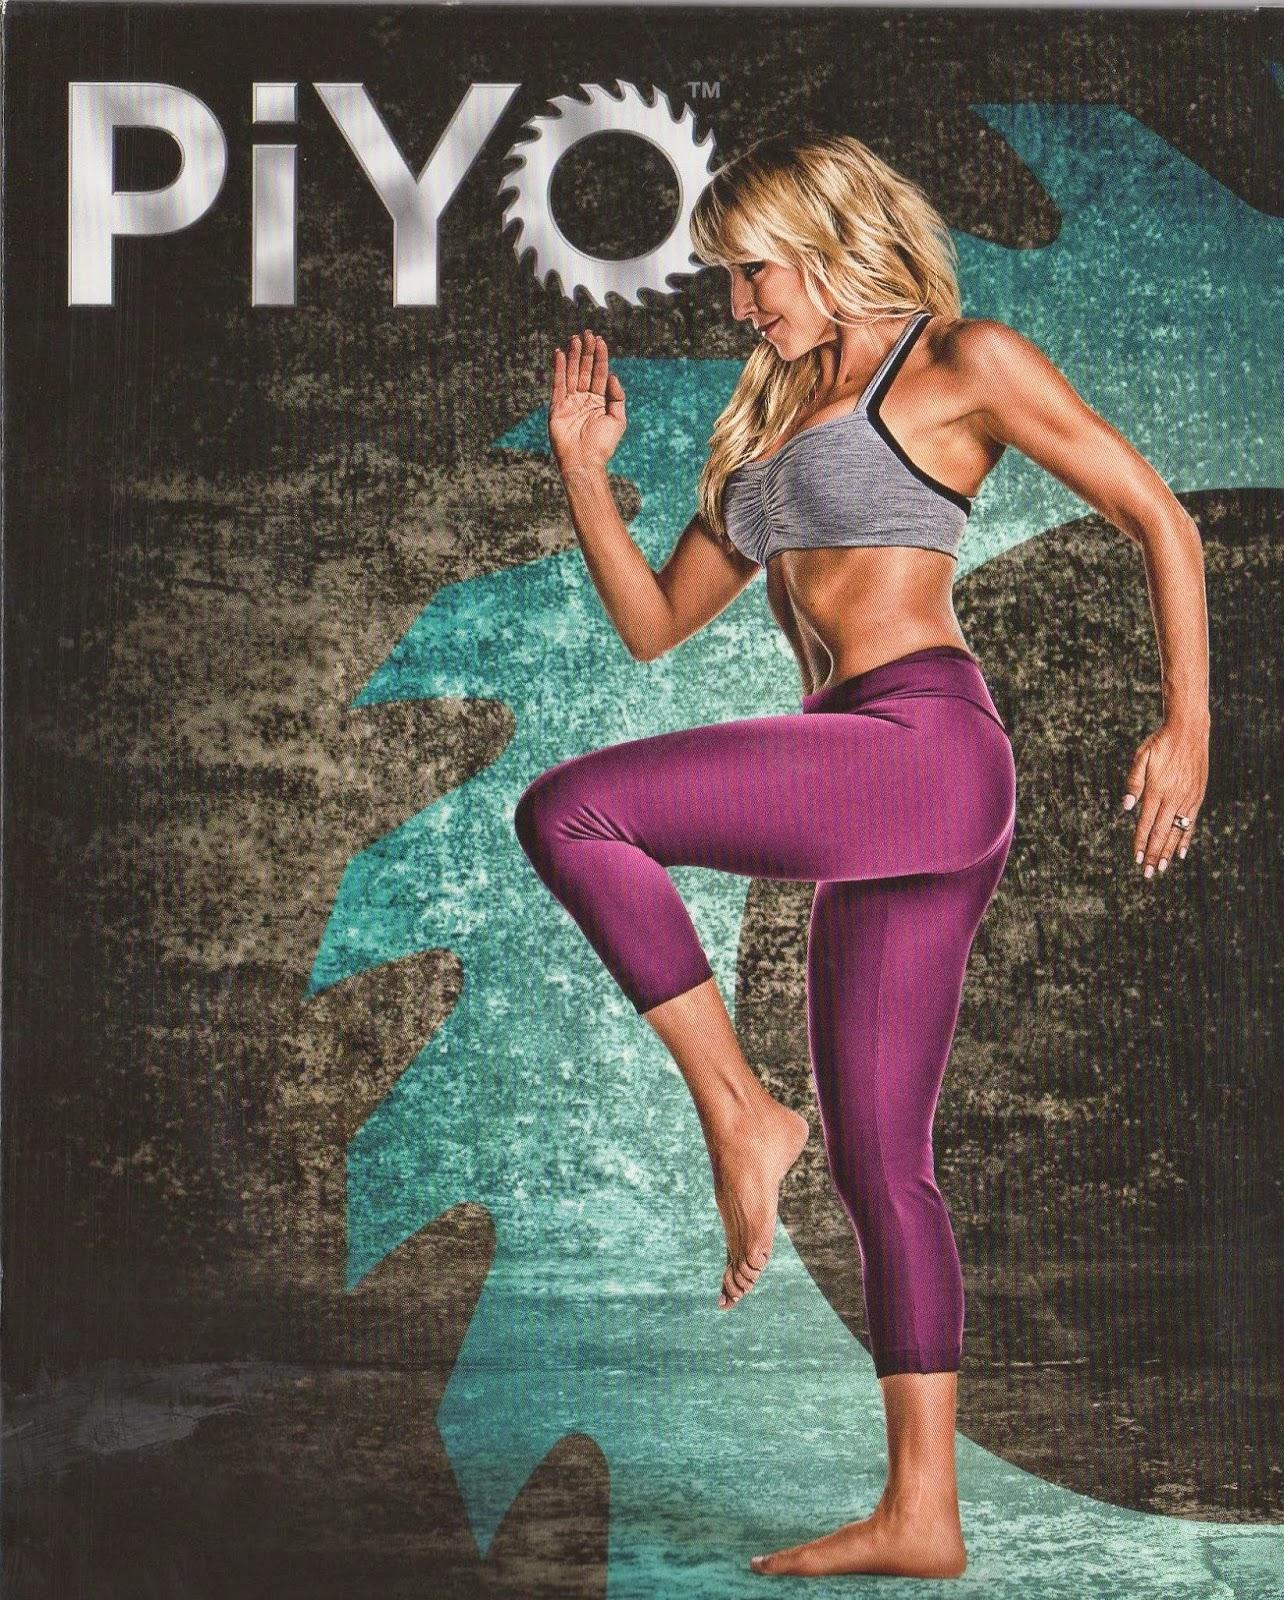 Saundra: PIYO Workout System - Information